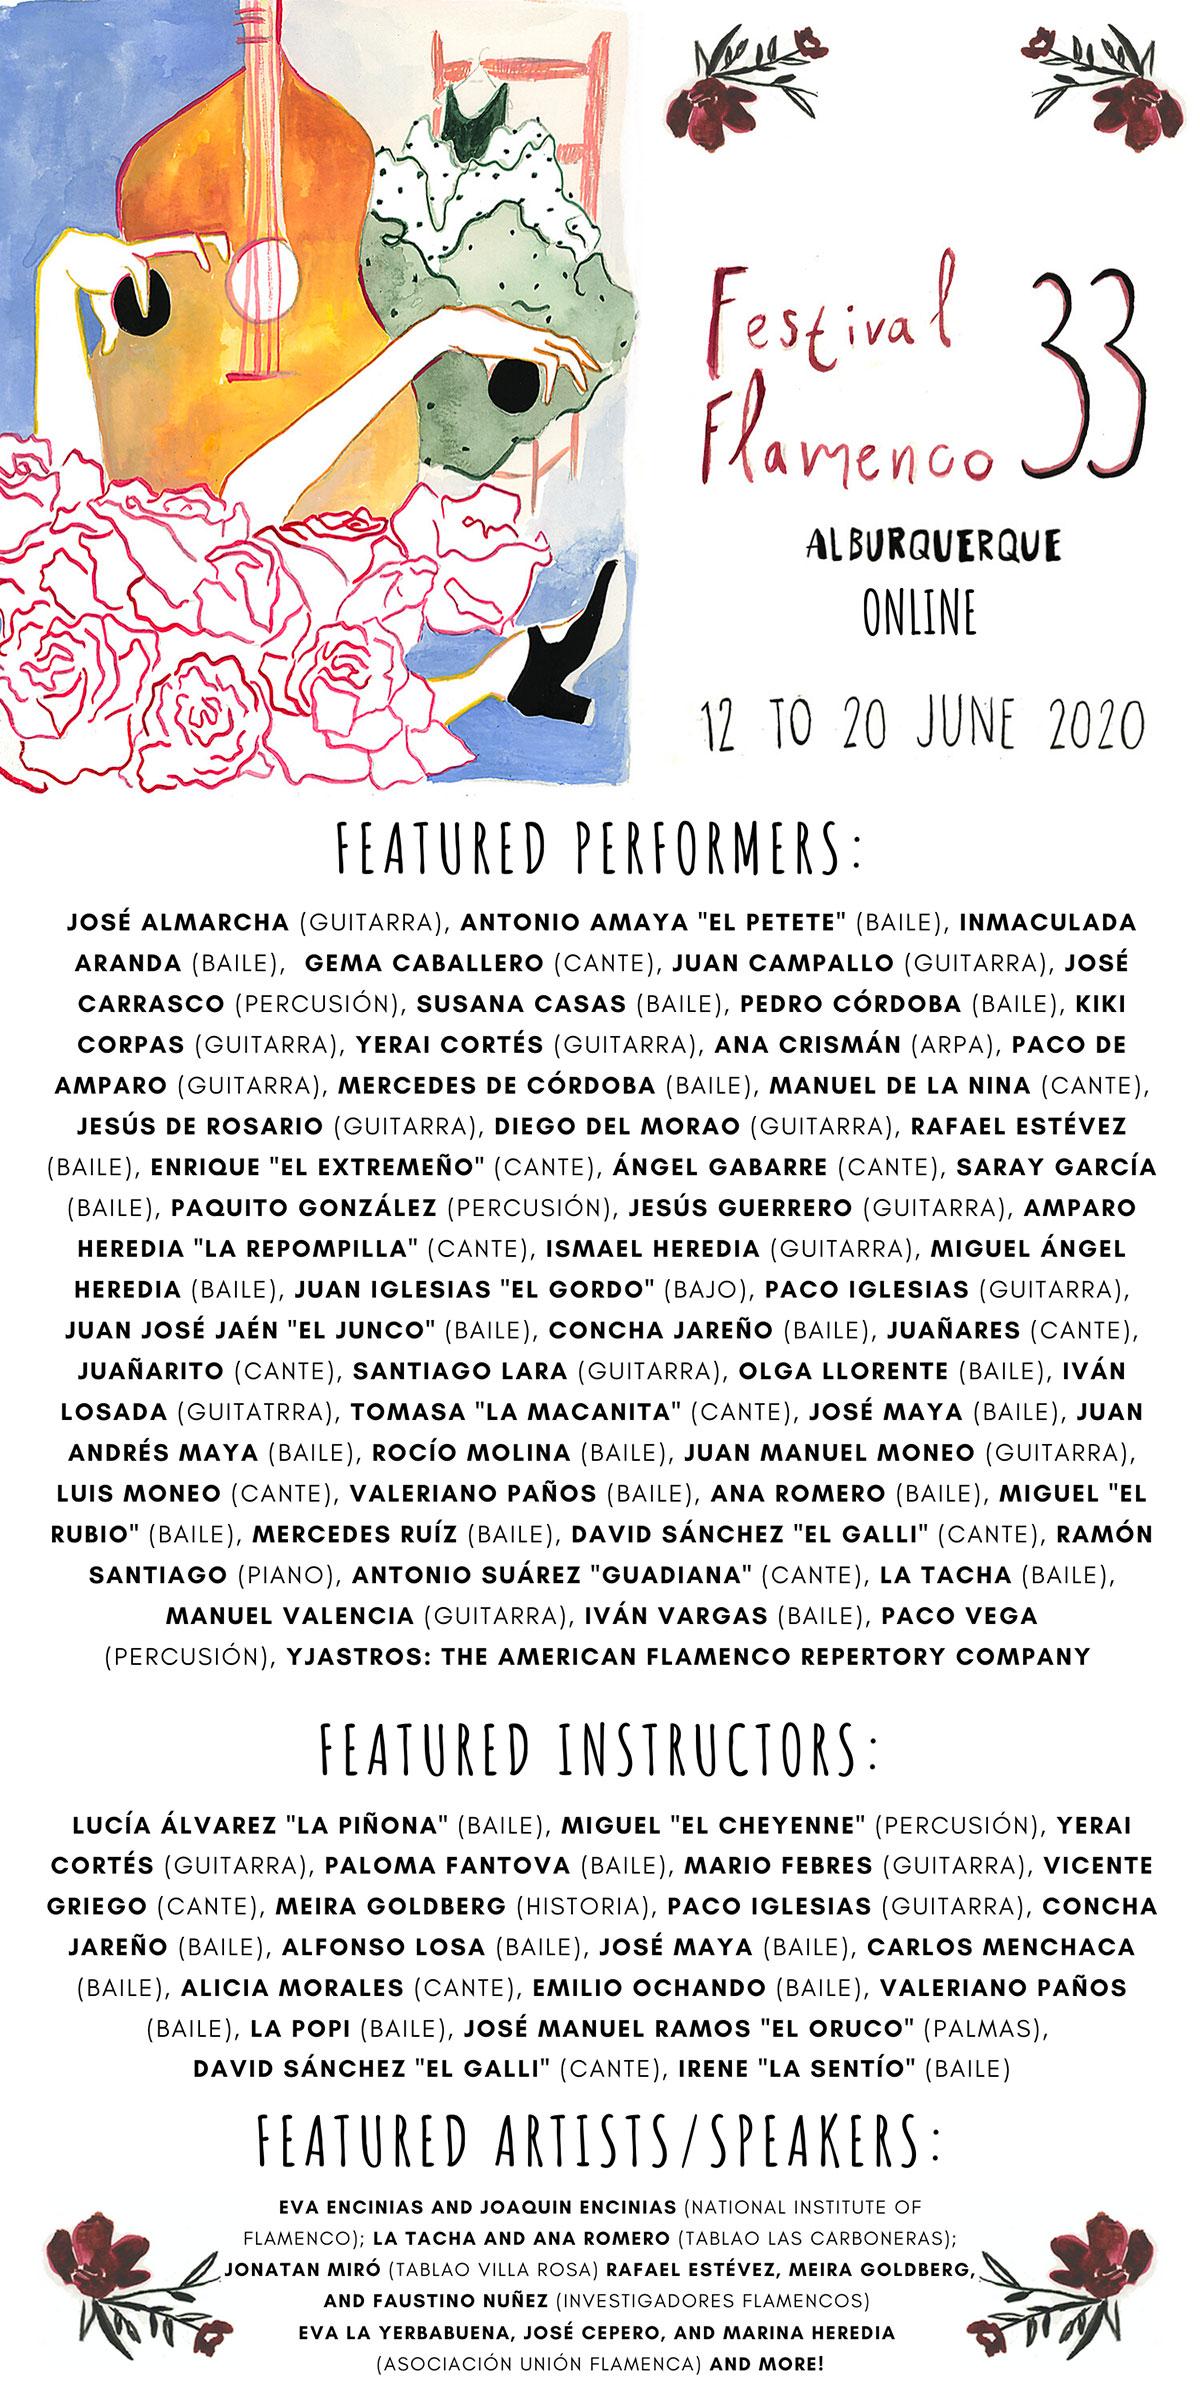 Festival Flamenco ALBURQUERQUE 33 - online